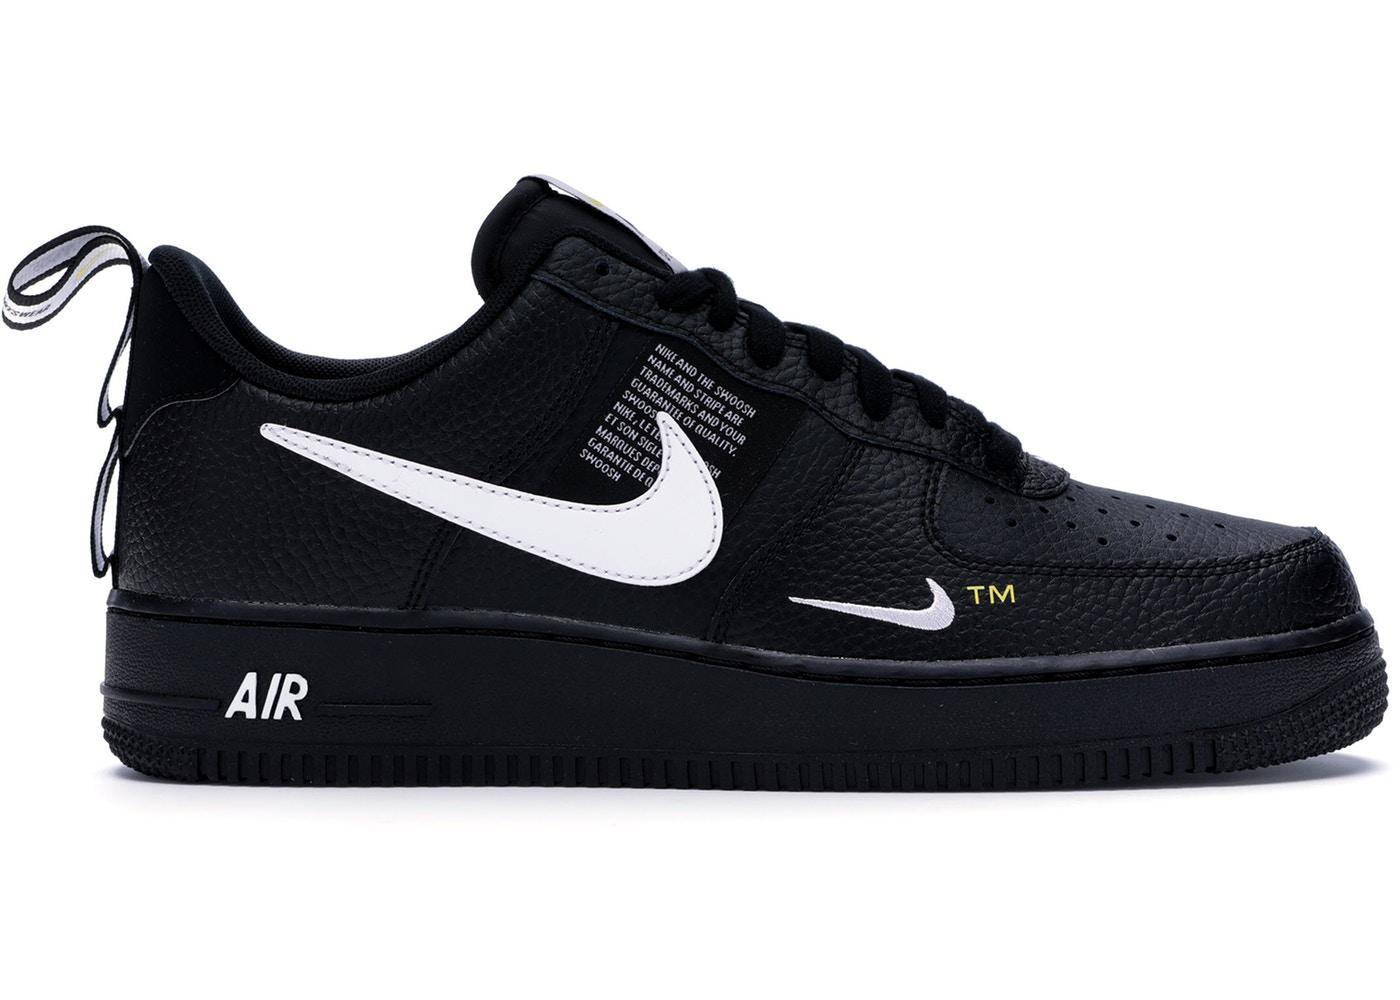 Nike Air Force 1 Utility Black Fashion